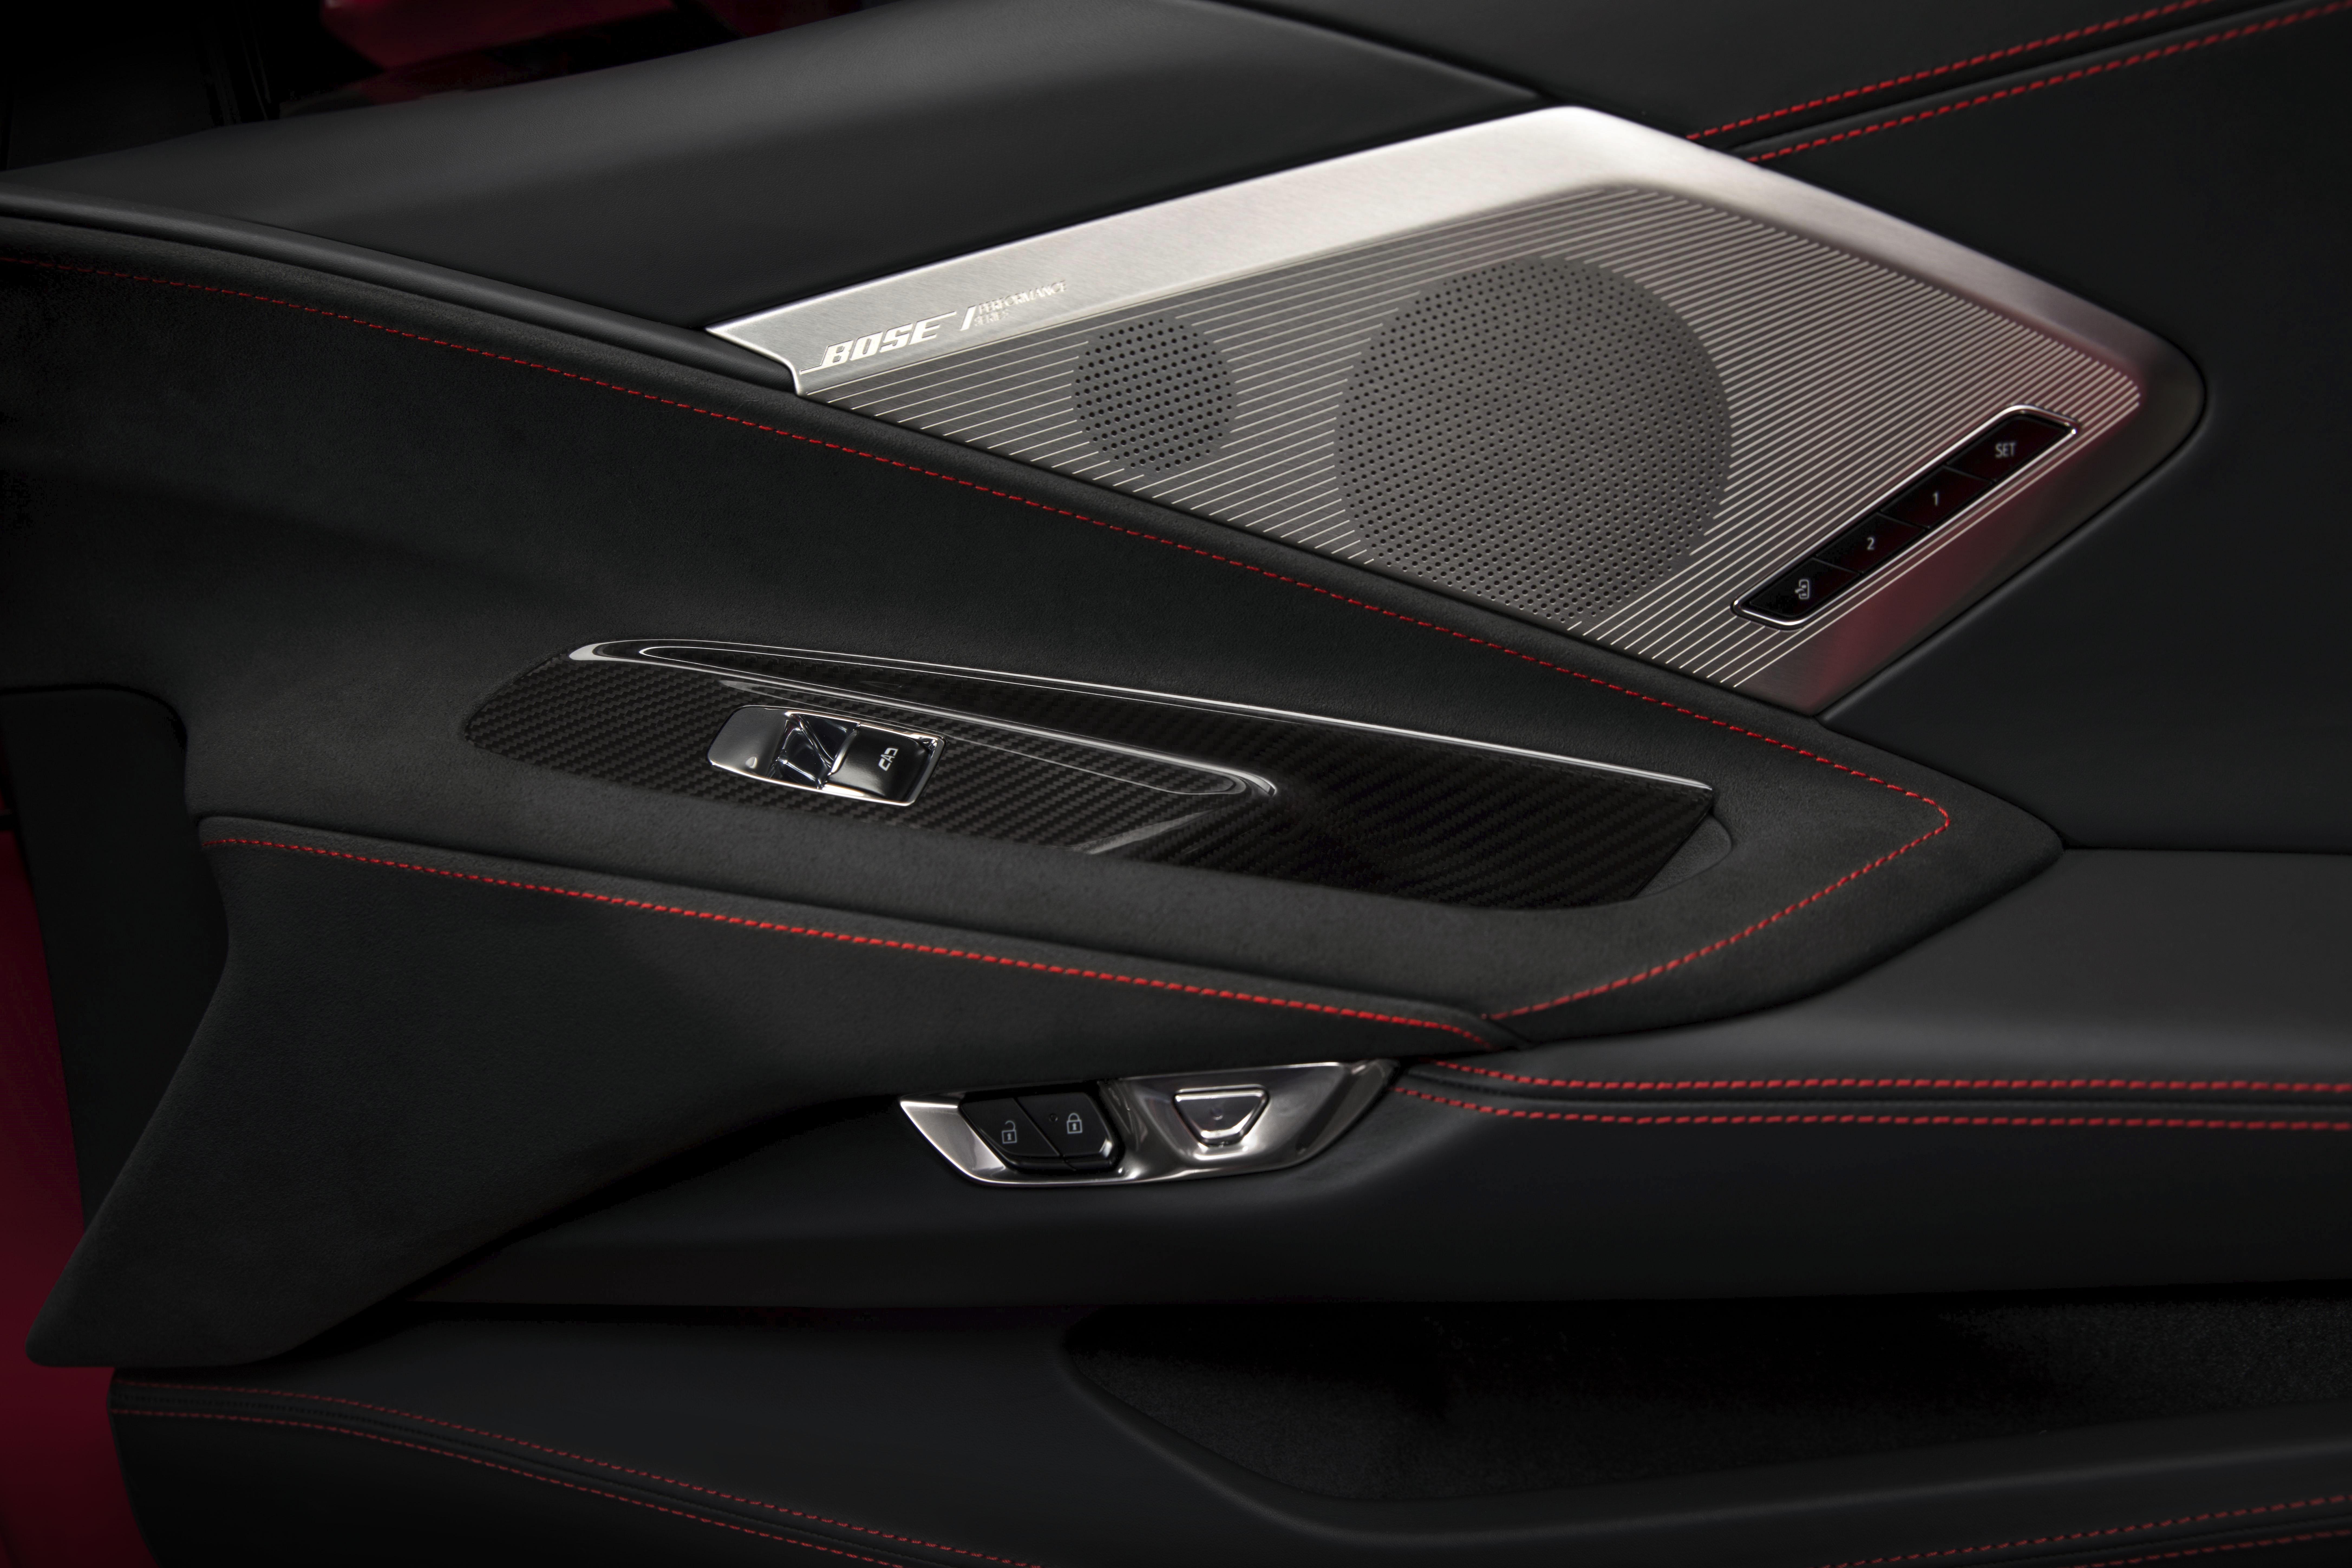 bose sound system corvette